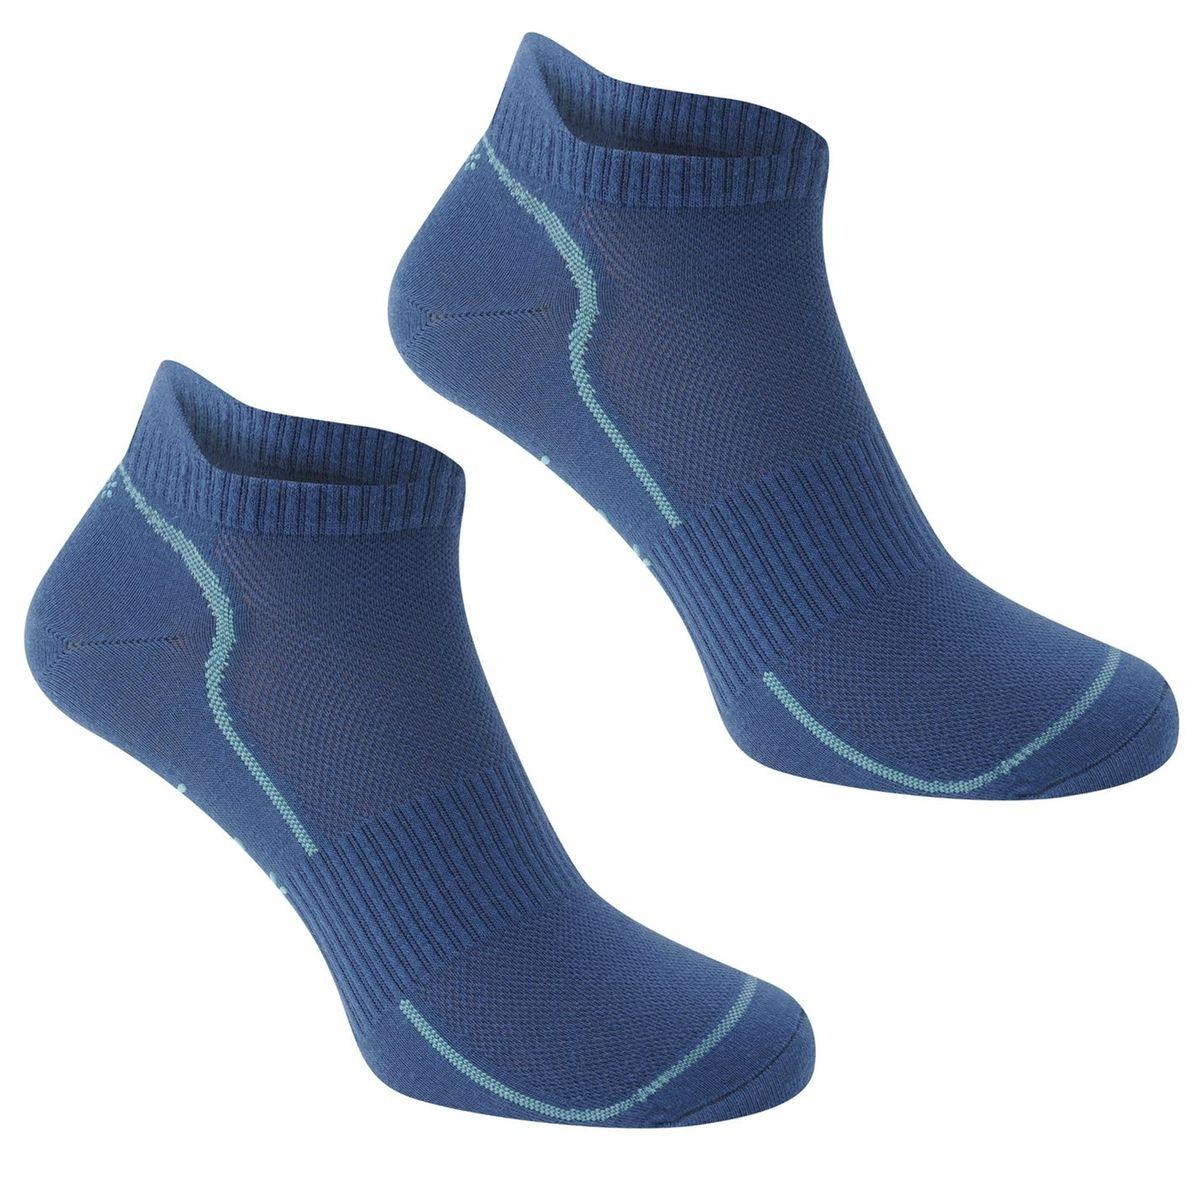 Socquettes de sport